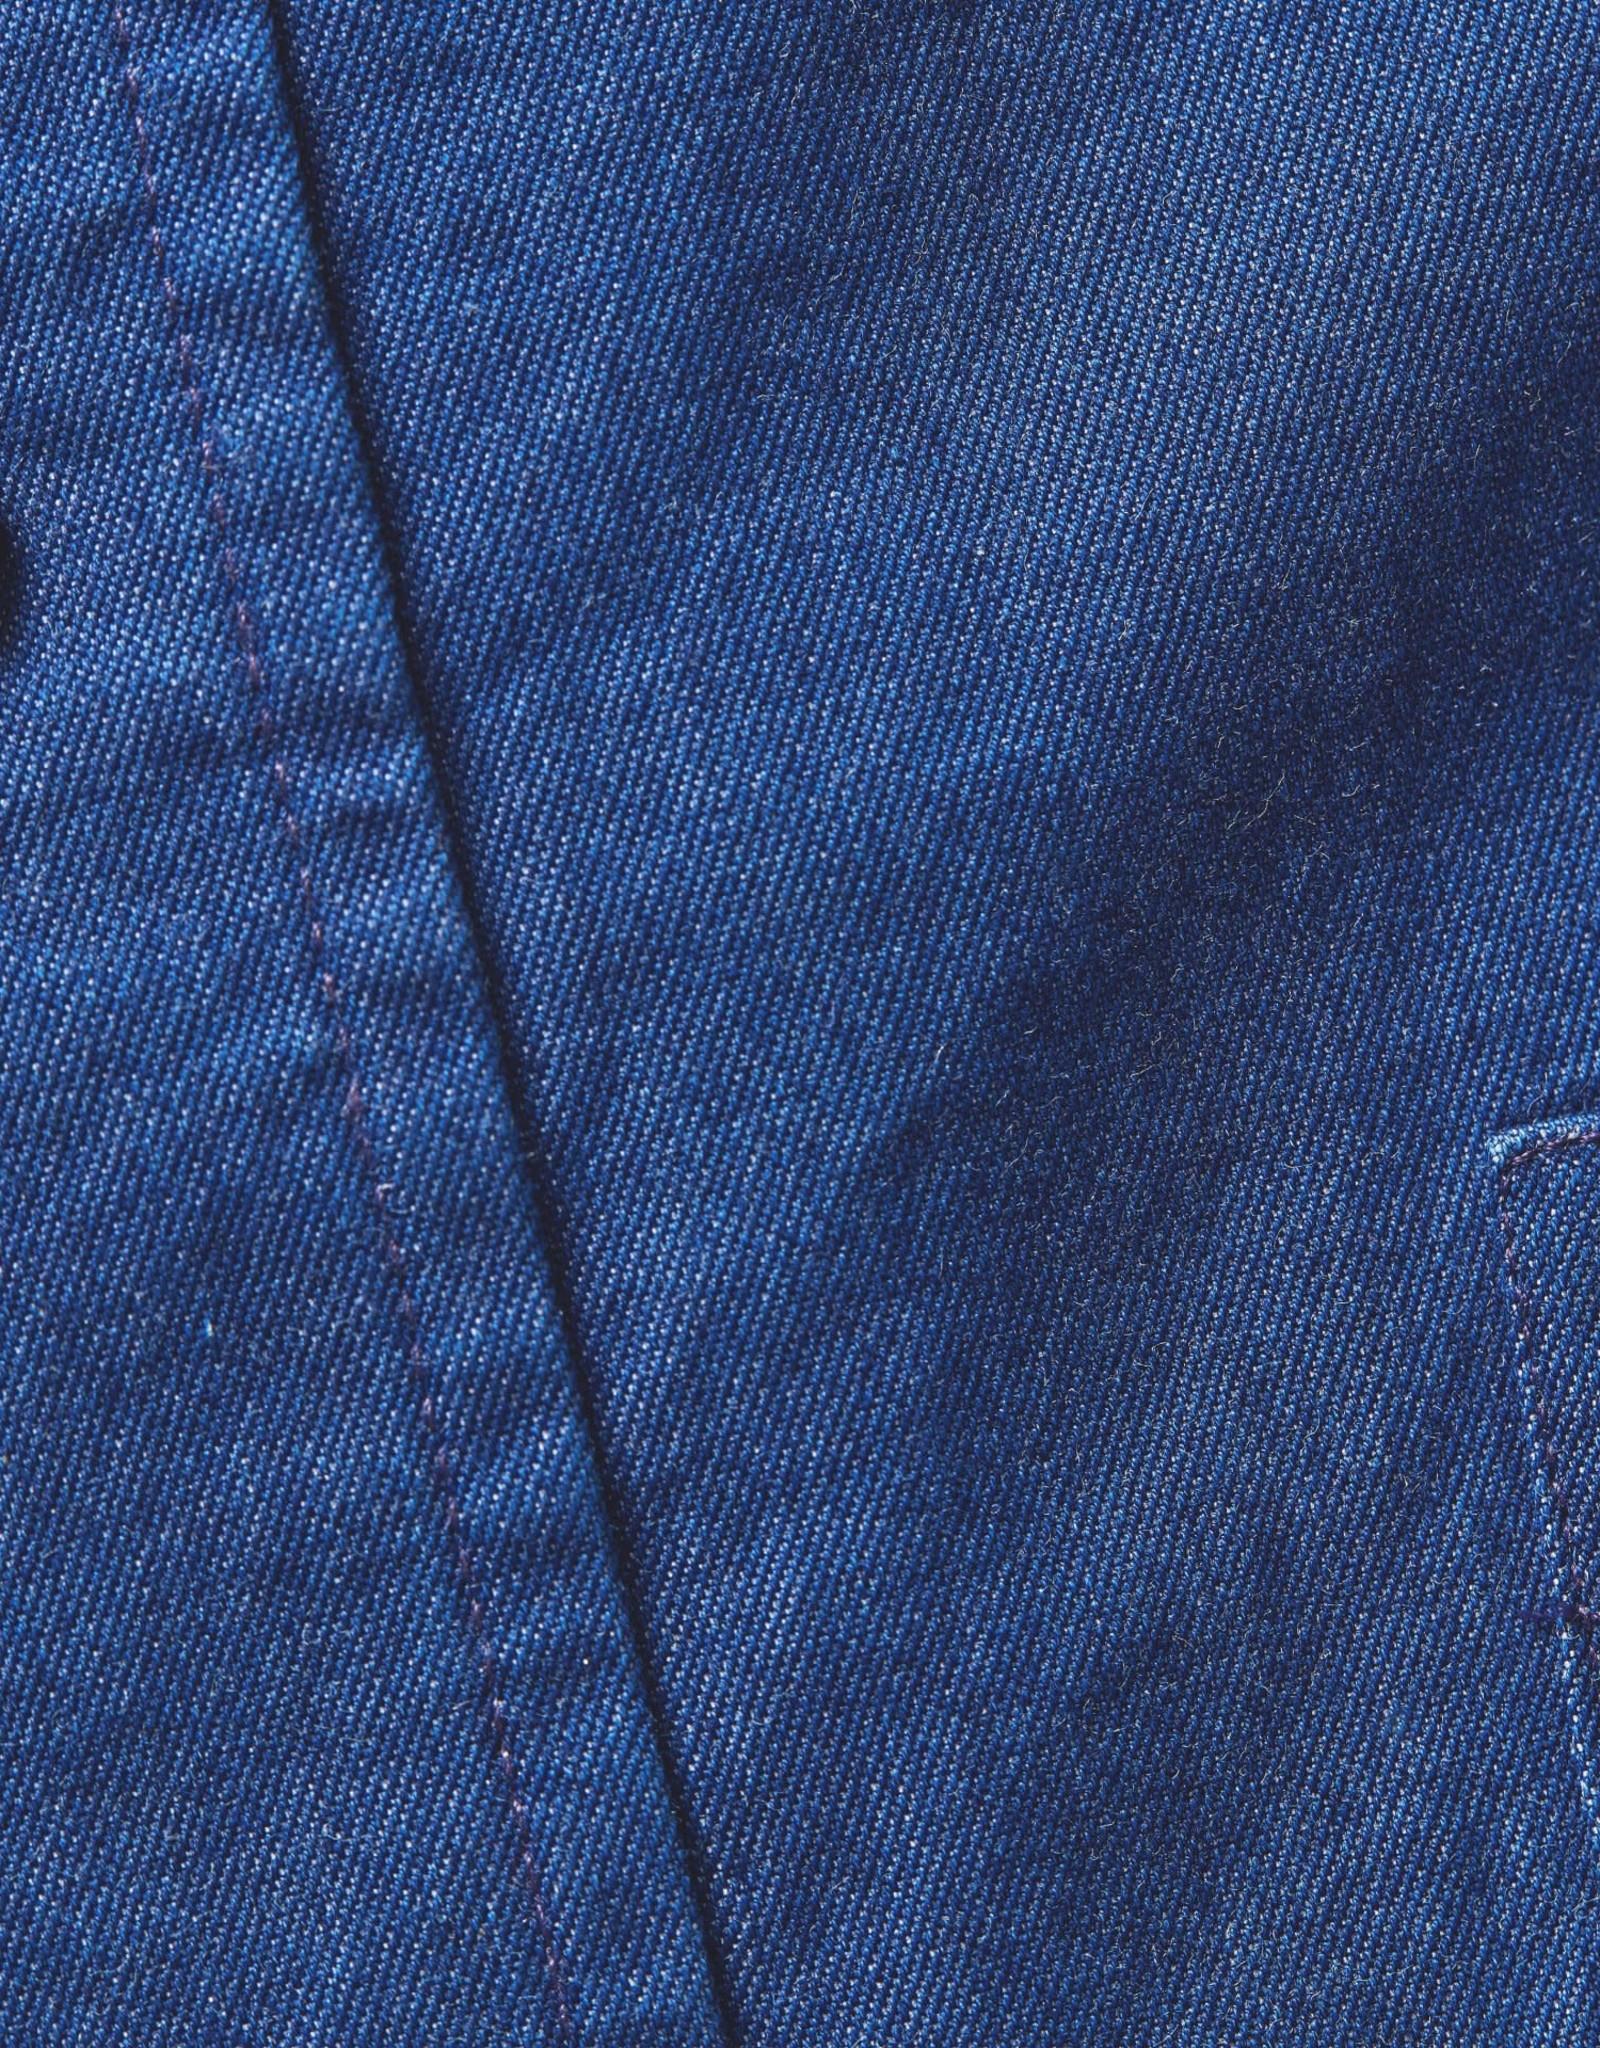 Eton Eton hemd blauw slimfit 0804-76617/28